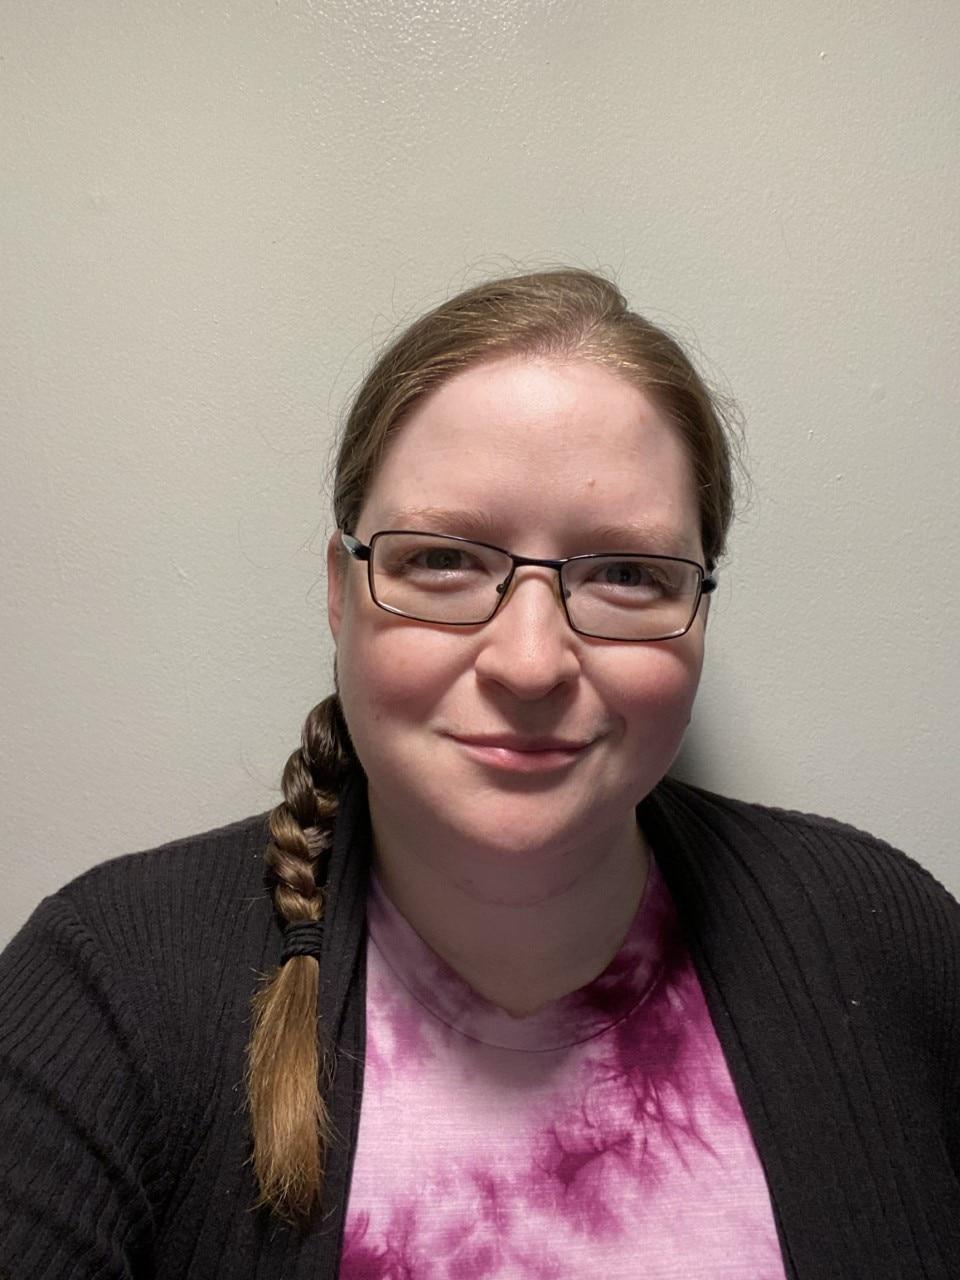 ELIZABETH FRANZOSA Financial Professional & Insurance Agent